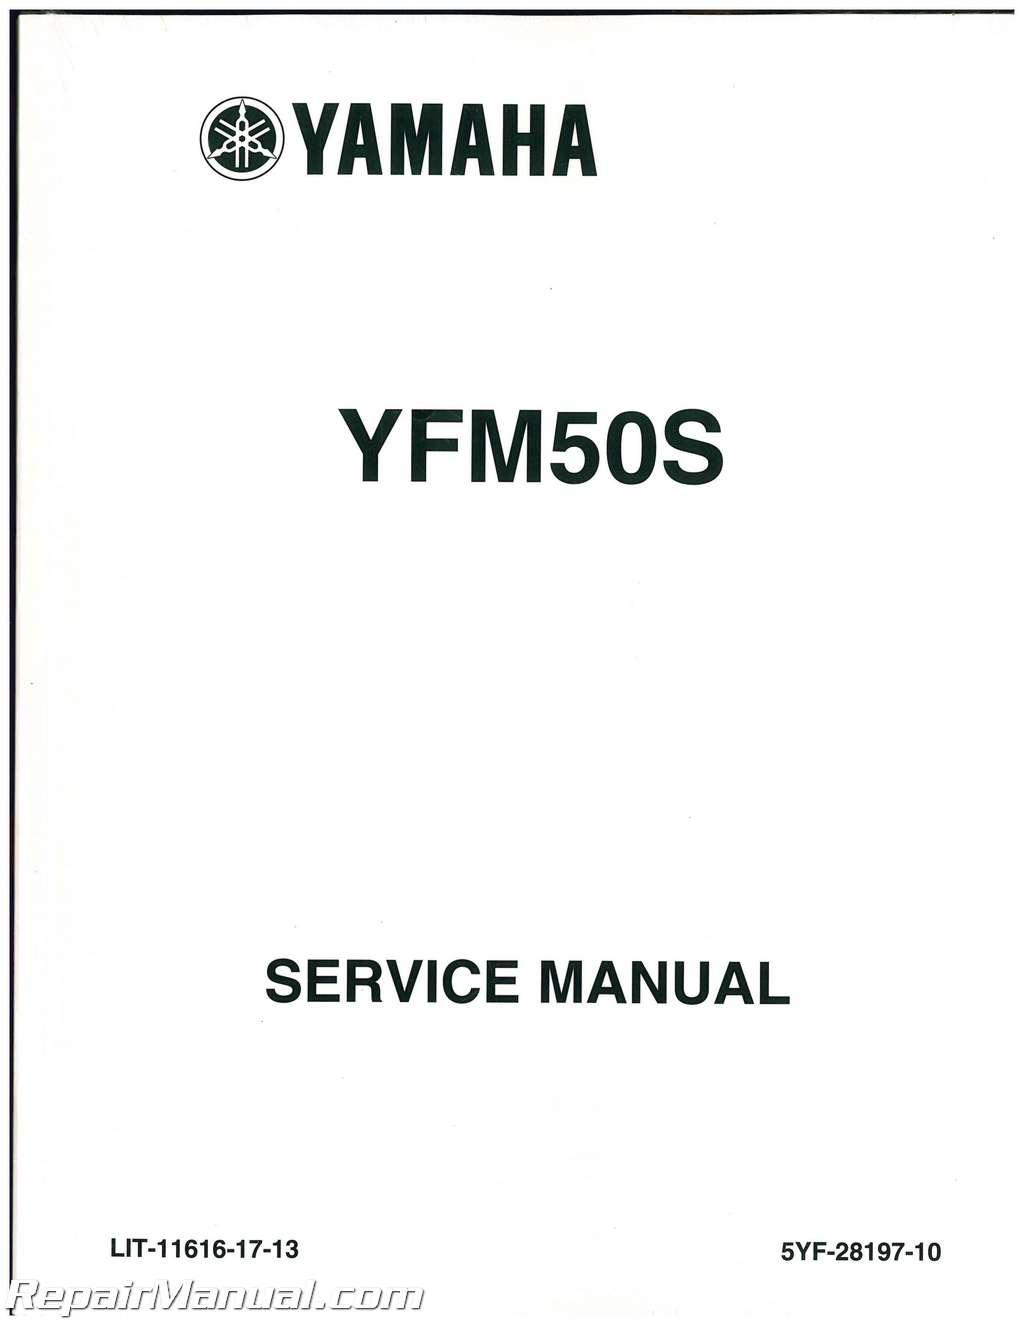 Yamaha Yfm50 Atv Raptor Service Manual